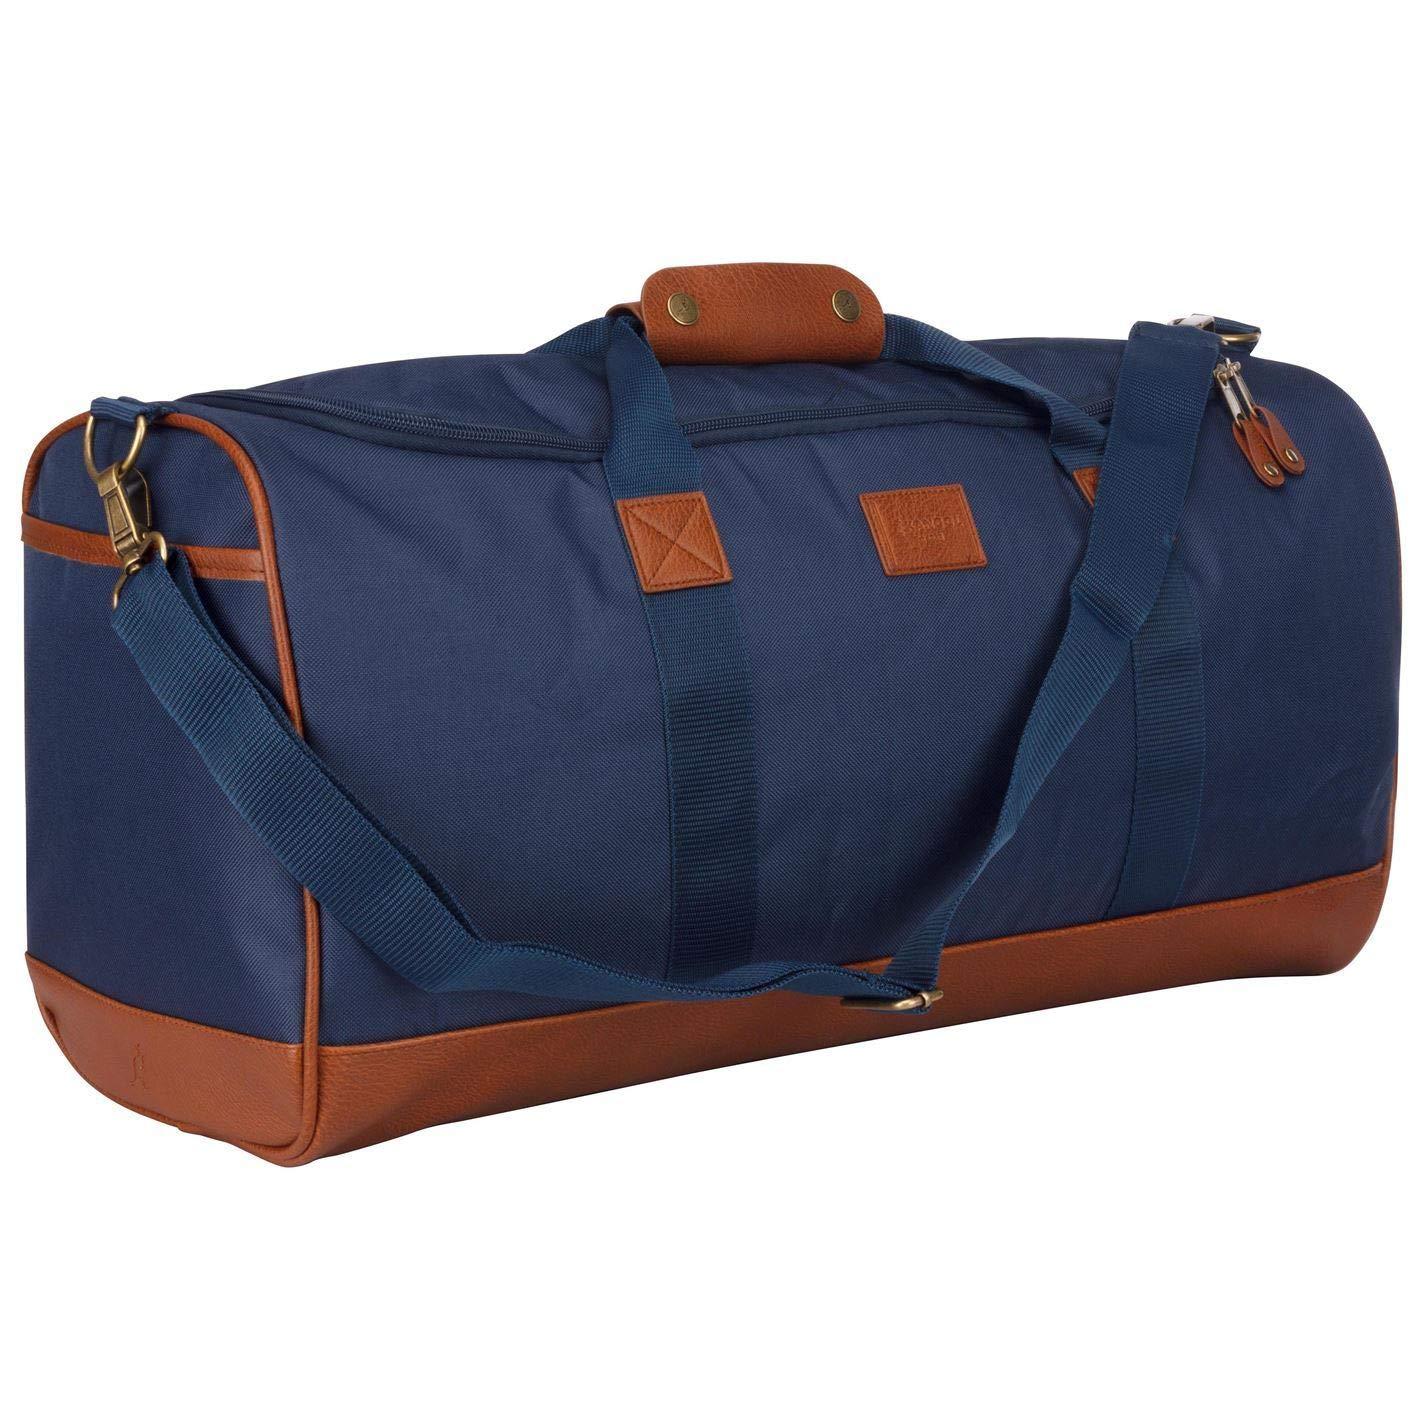 d24cddef Amazon.com | Kangol Bags Holdalls Backpacks Messenger Flight Bags Daypacks  H:29 x W:57 x D:27 (cm) Antique Holdall - Brown | Messenger Bags